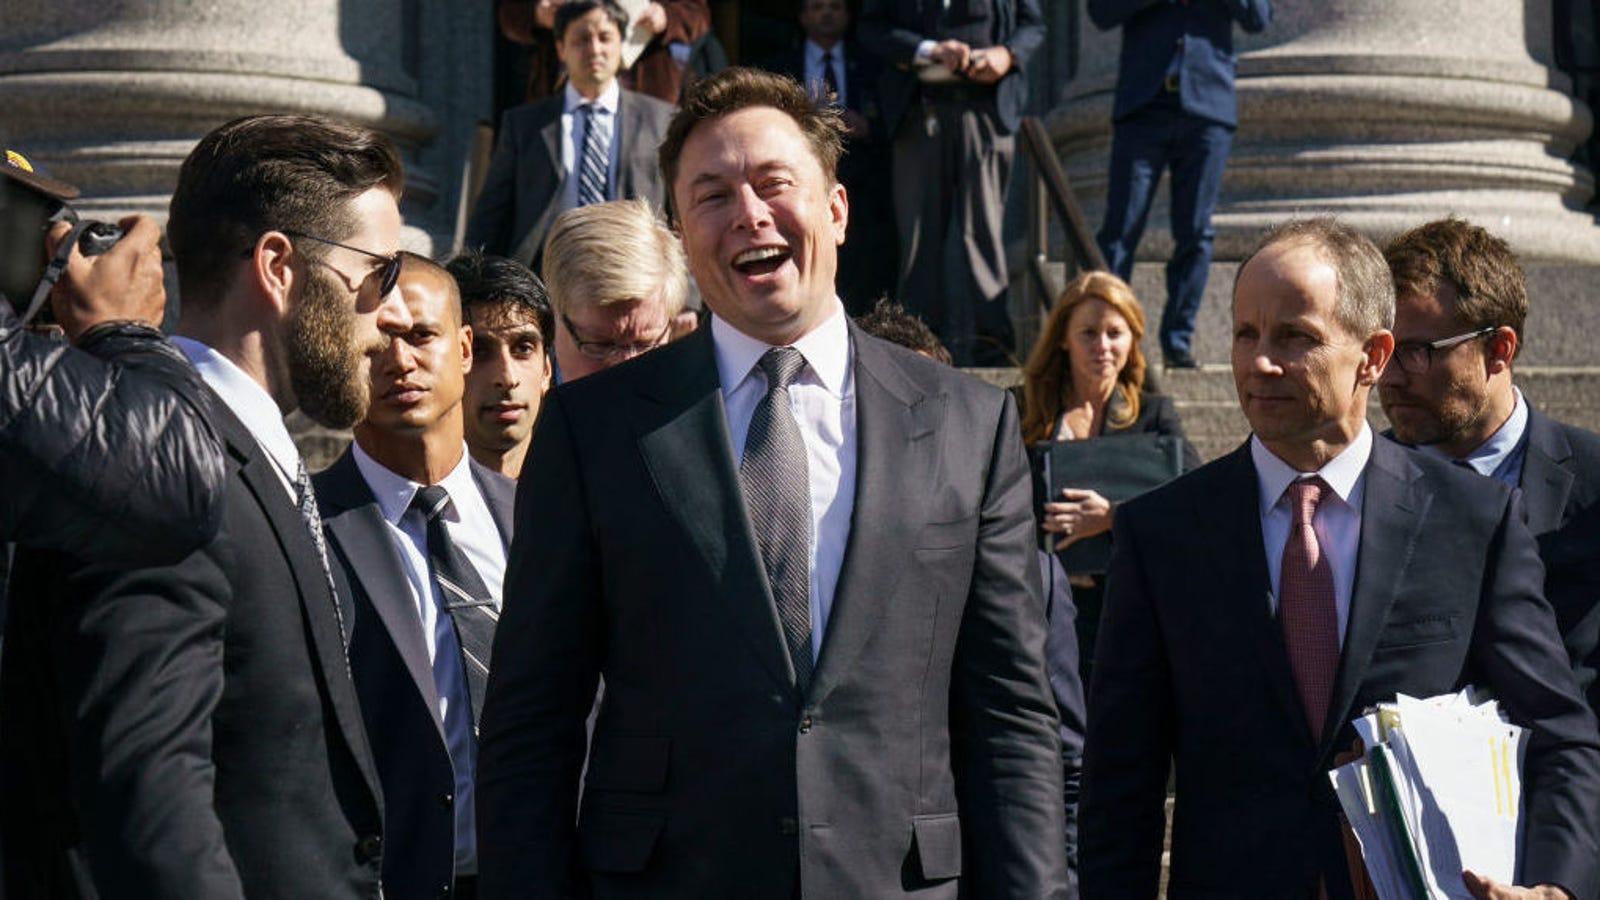 'I Will Nuke You', Elon Musk Allegedly Tells Former Employee